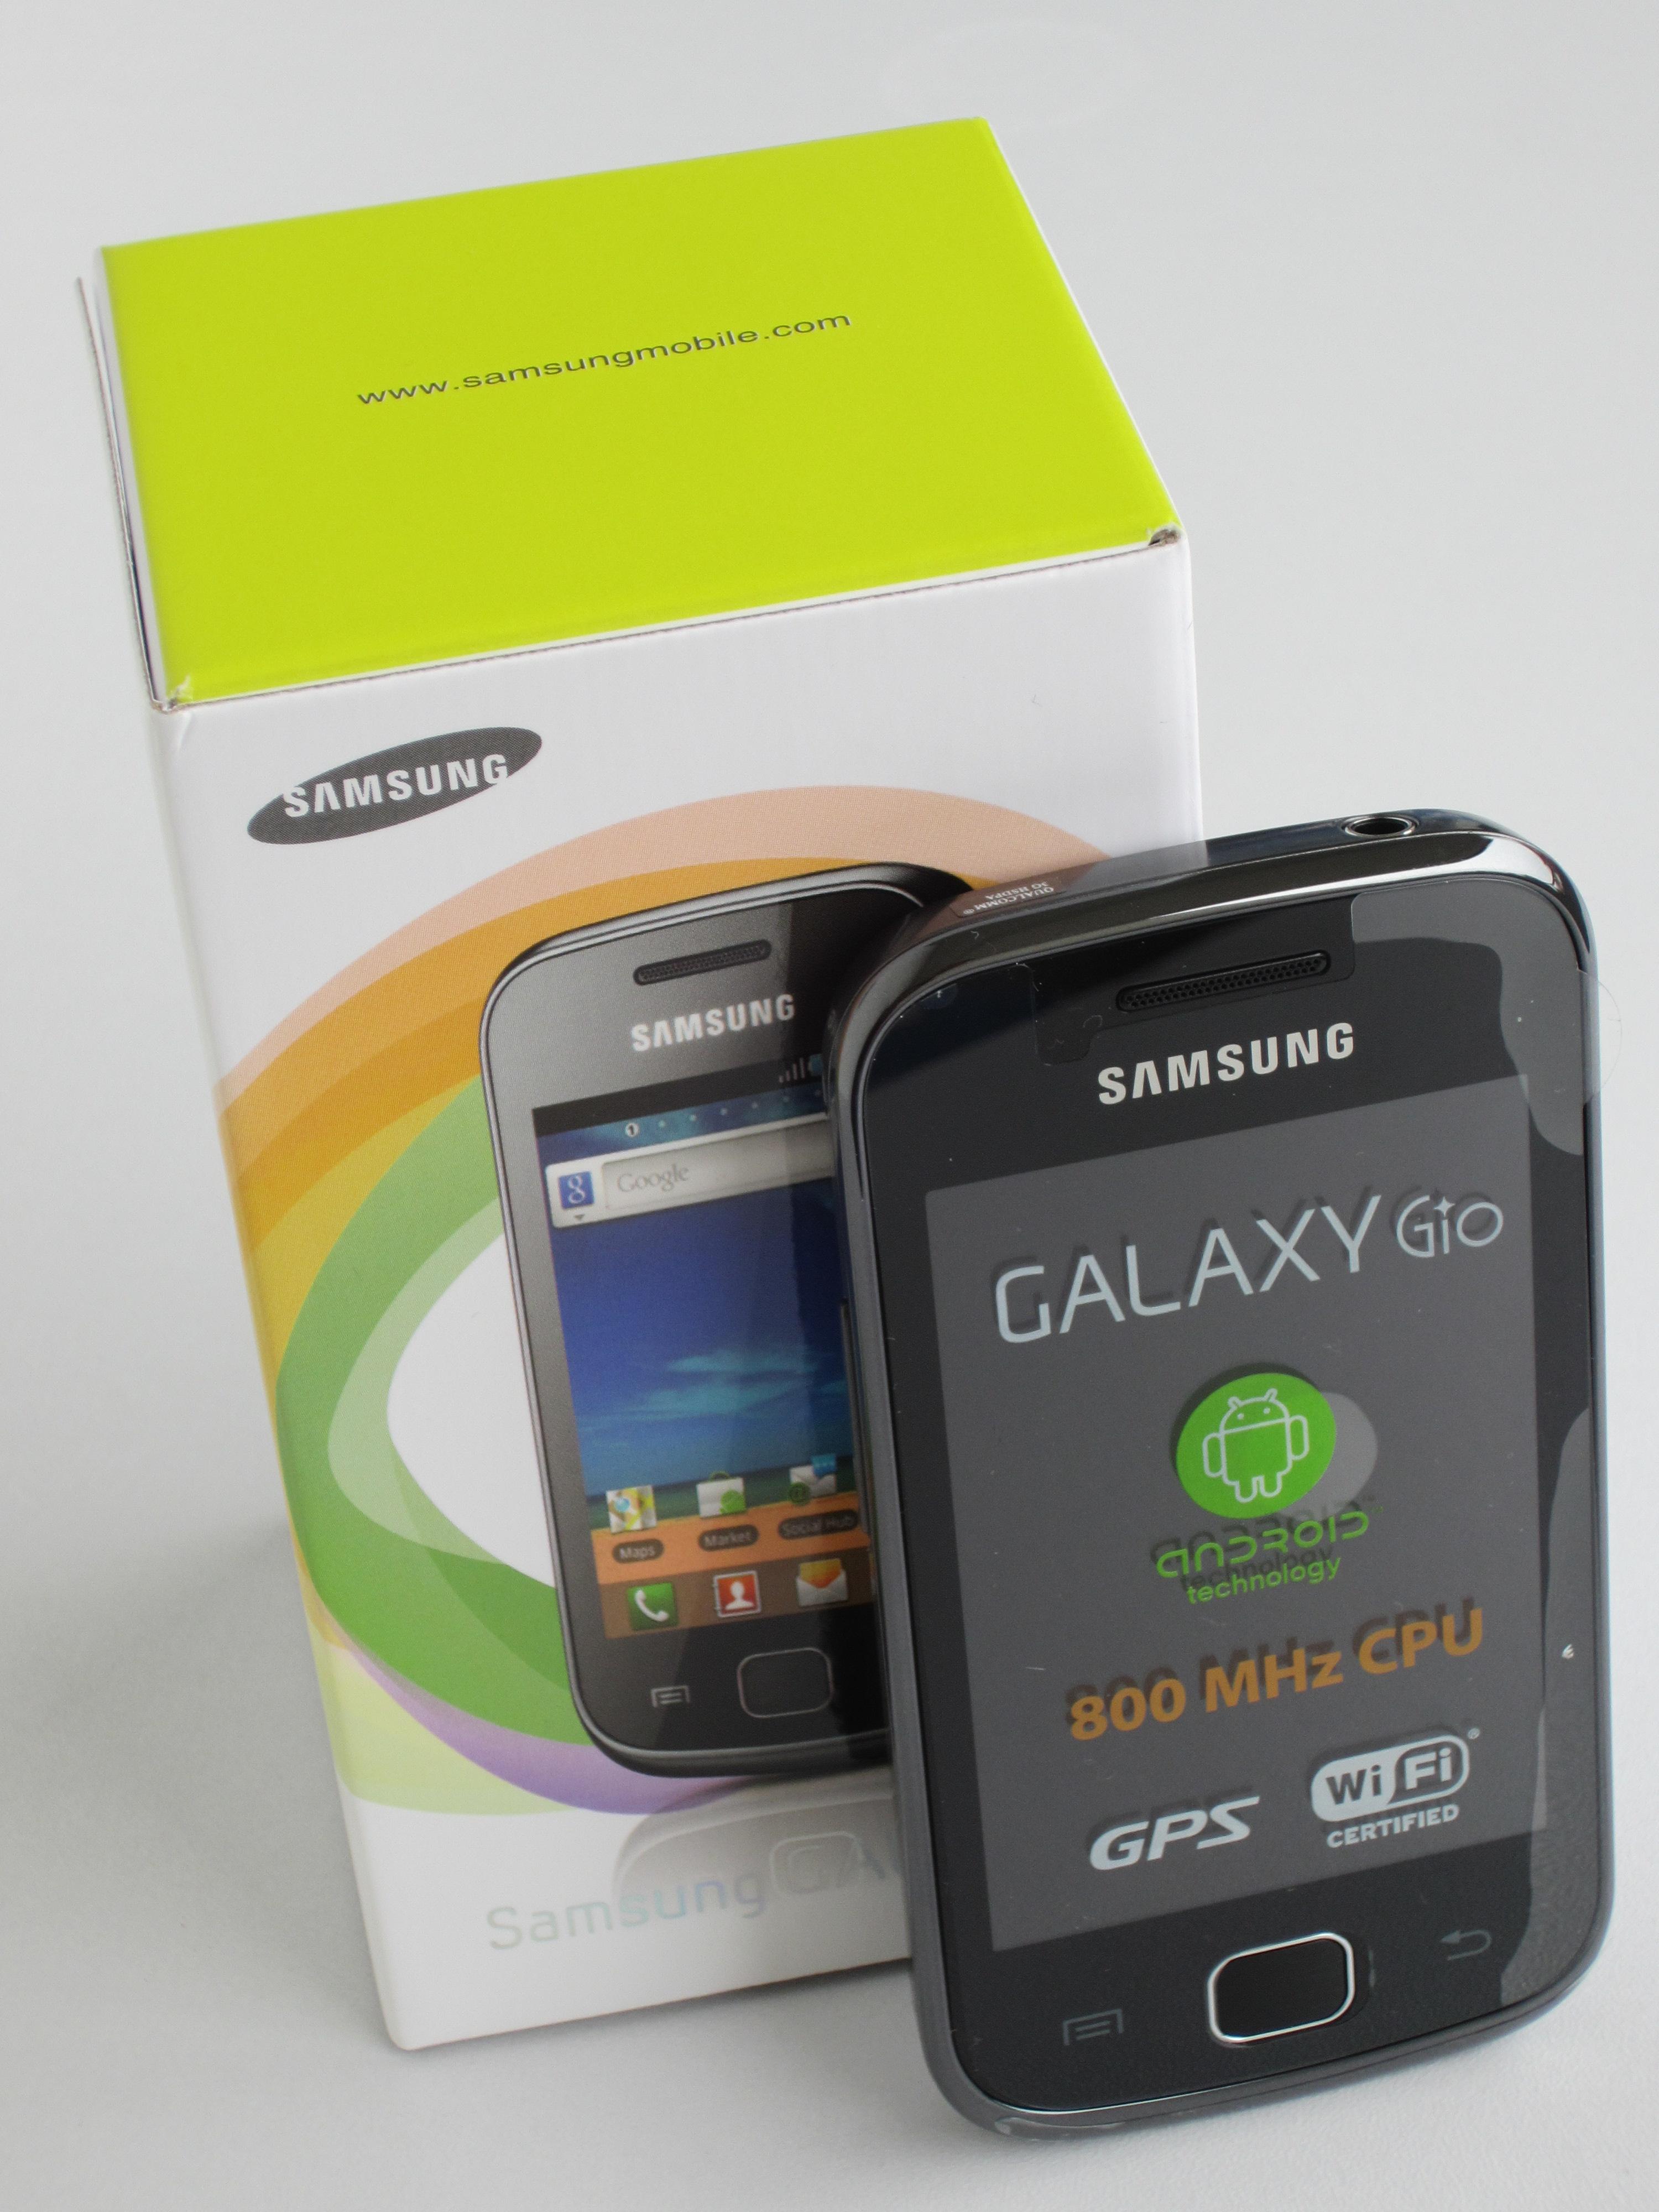 Samsung Galaxy Gio - Wikipedia